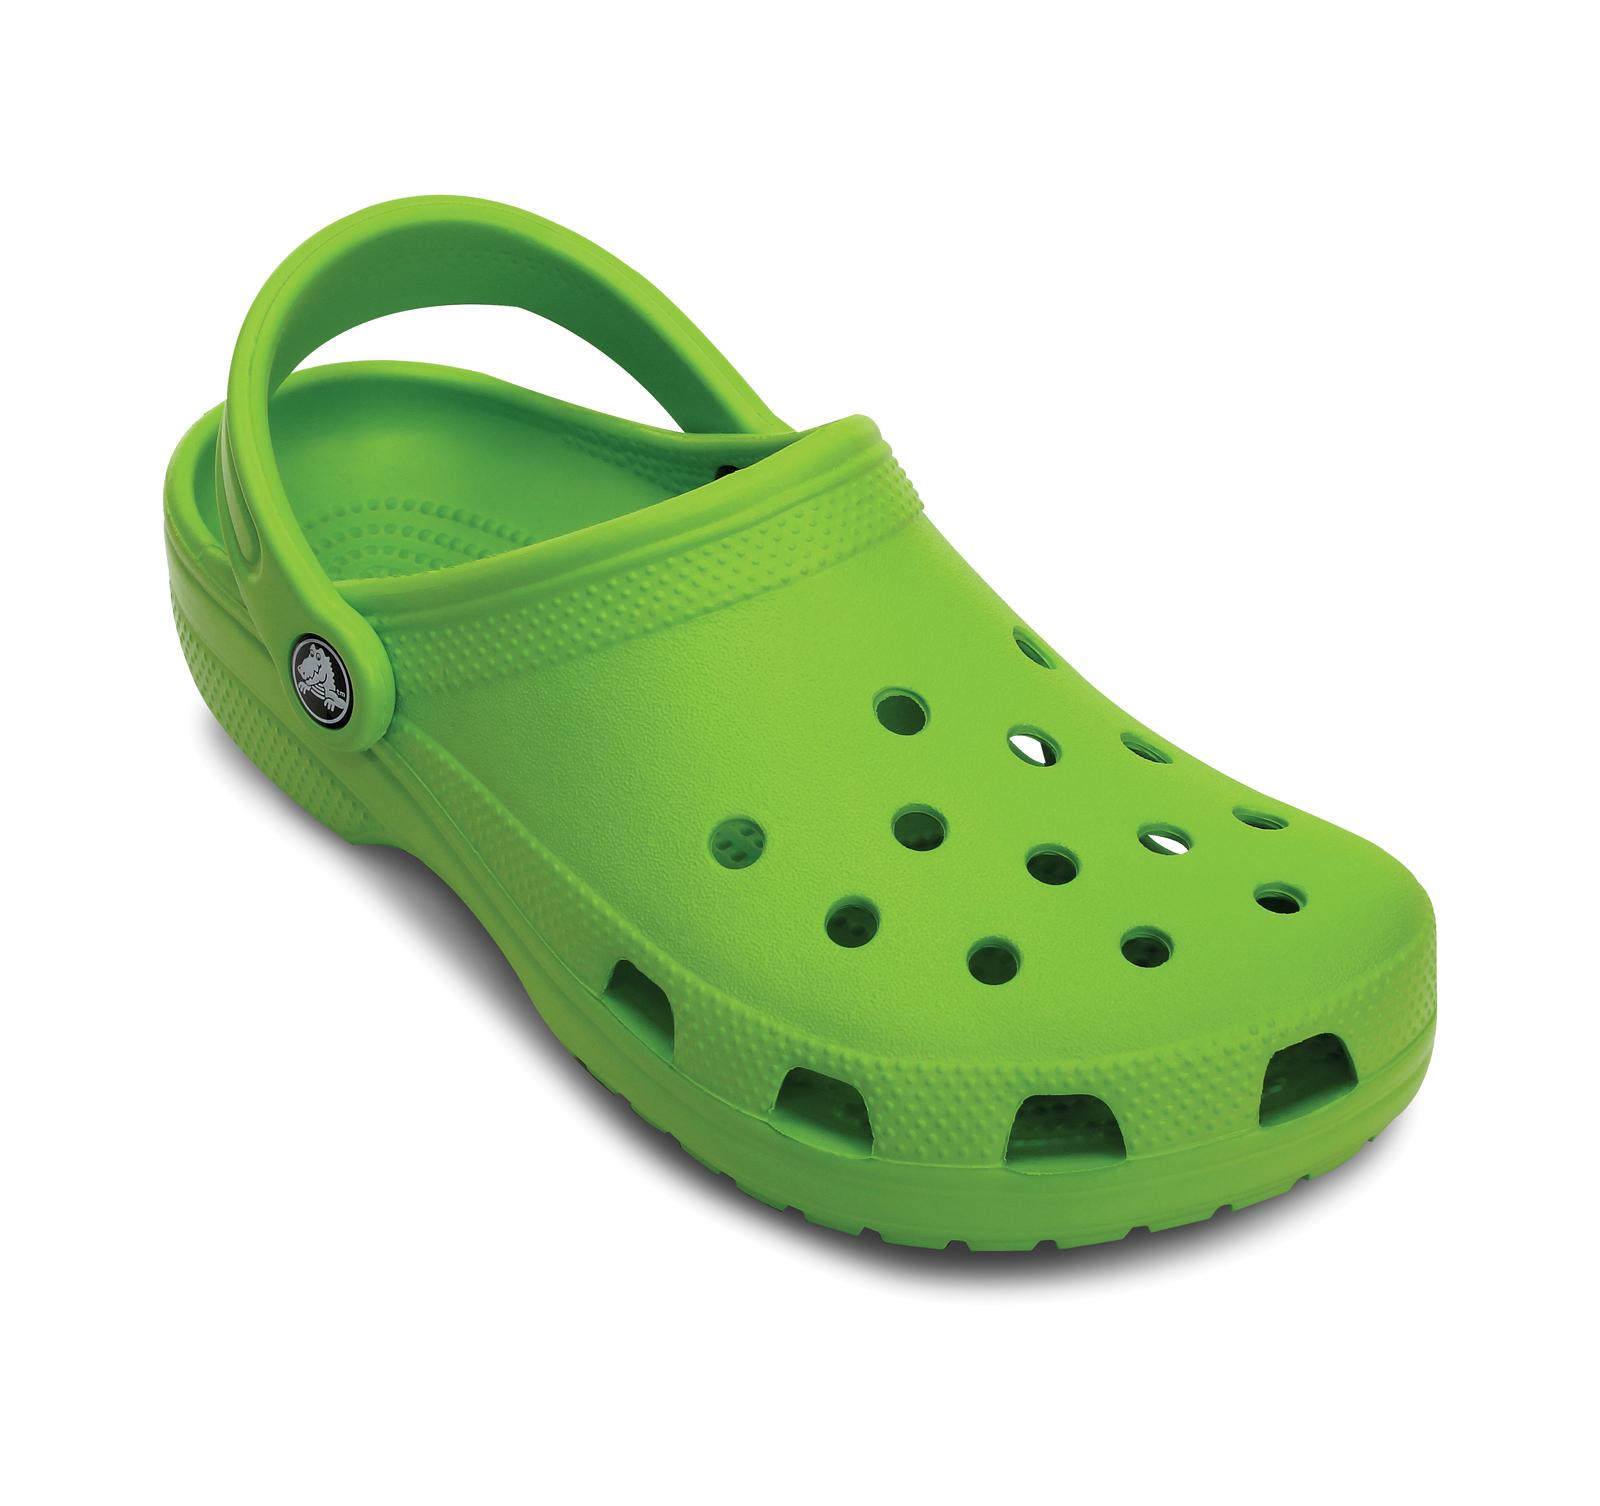 de5cce03a4ba76 New Genuine Crocs Classic Mens Womens Unisex Comfort Sandals Clogs ...